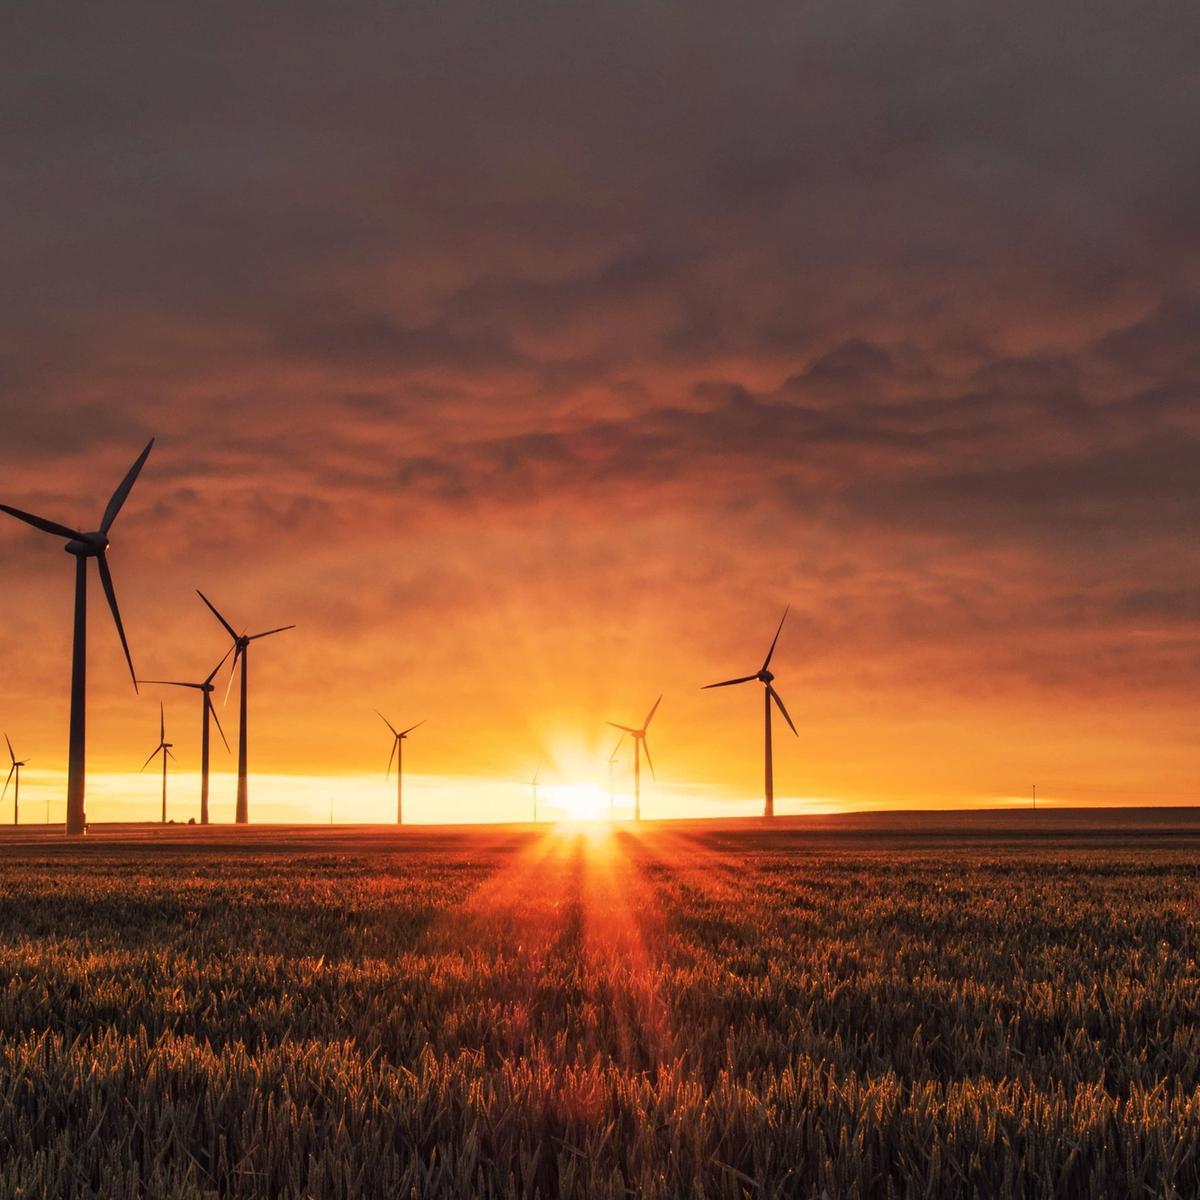 Photo of wind turbines in a field